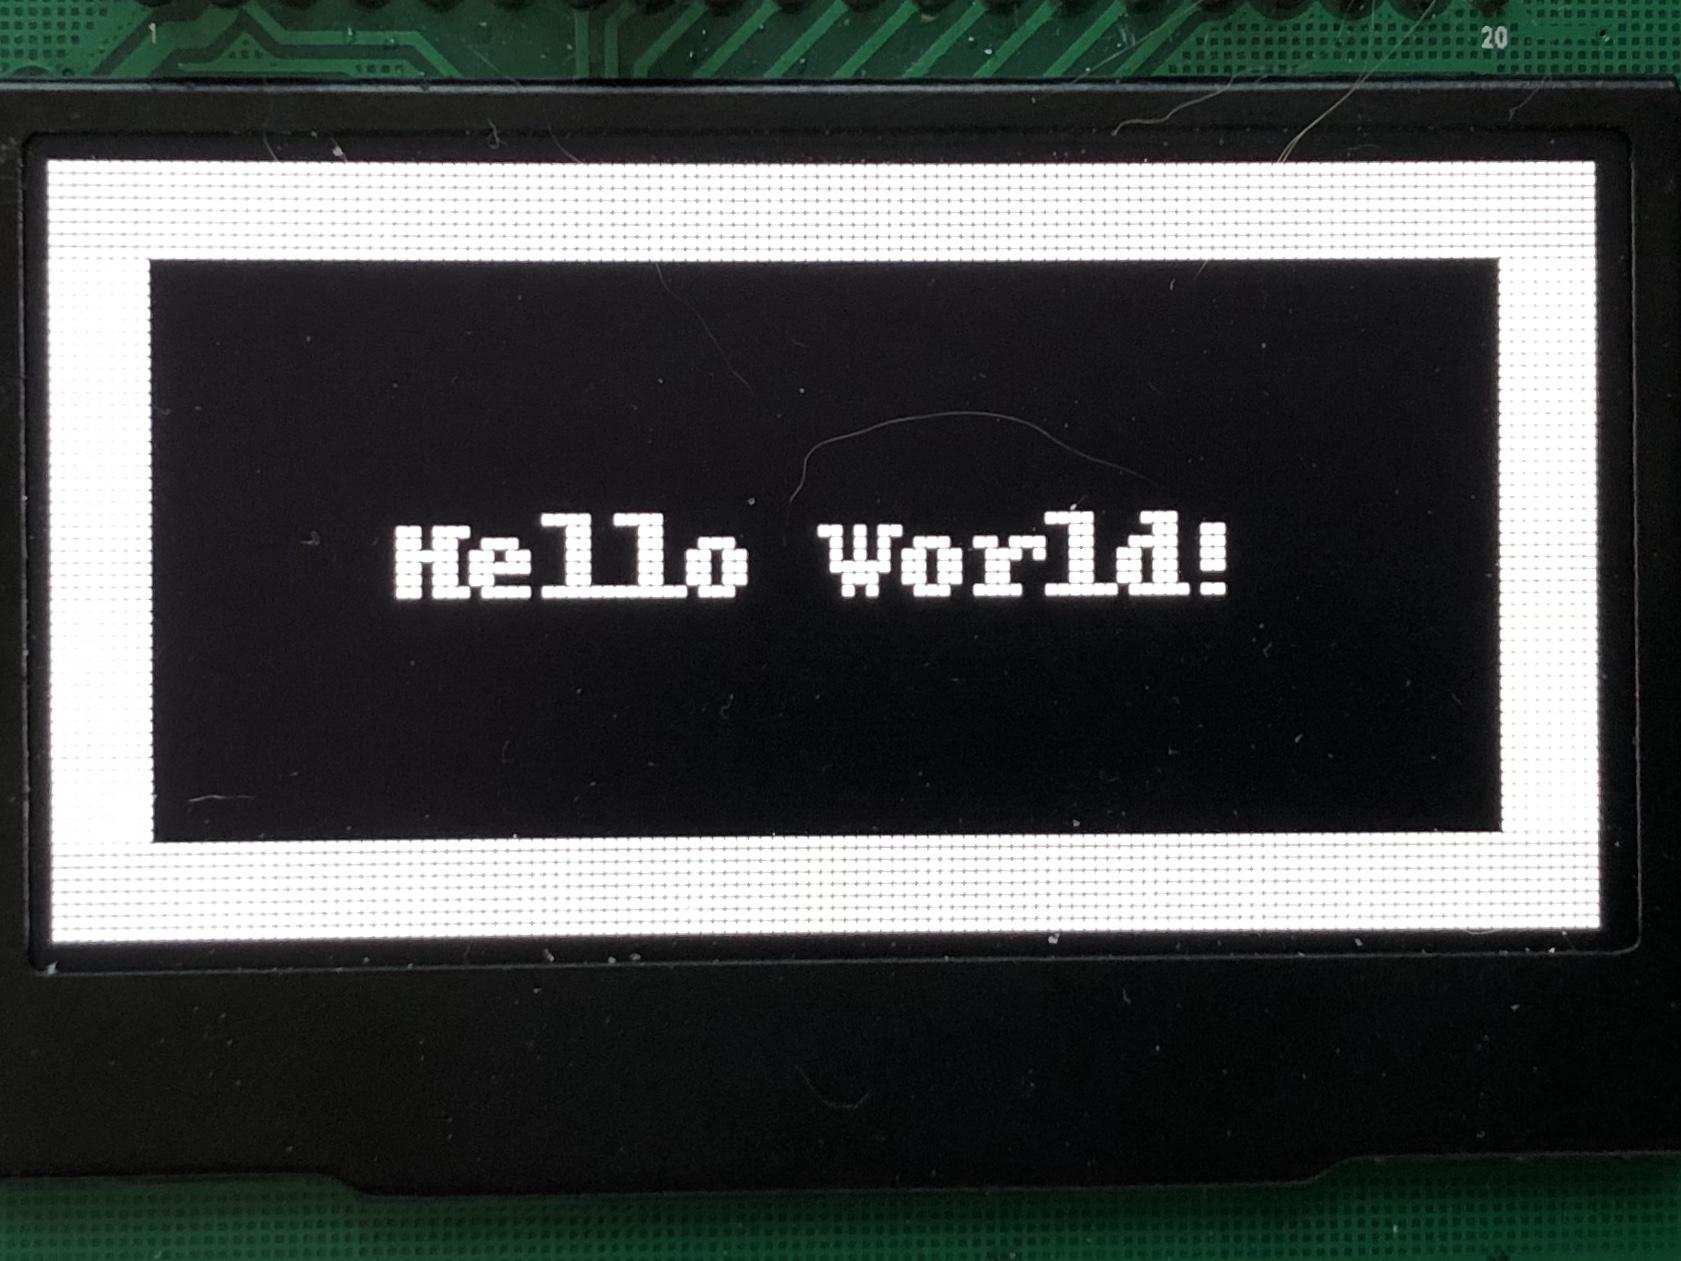 adafruit_products_python-hello-world.jpeg